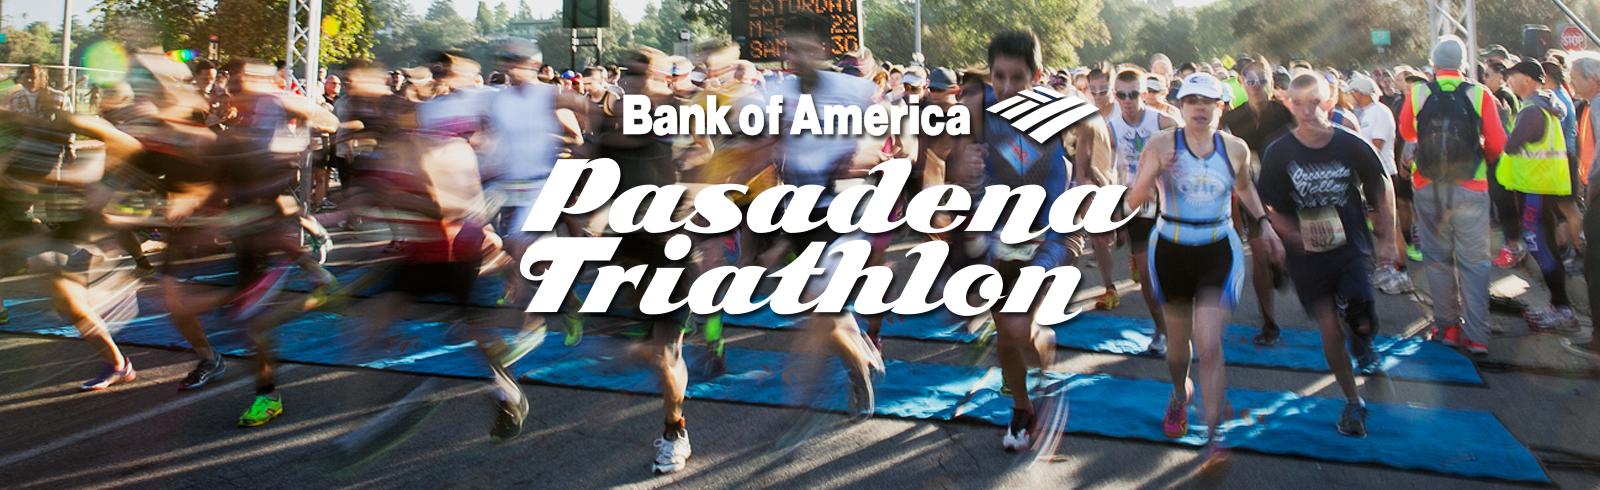 GE-Pasadena-Tri-Event-Slide3